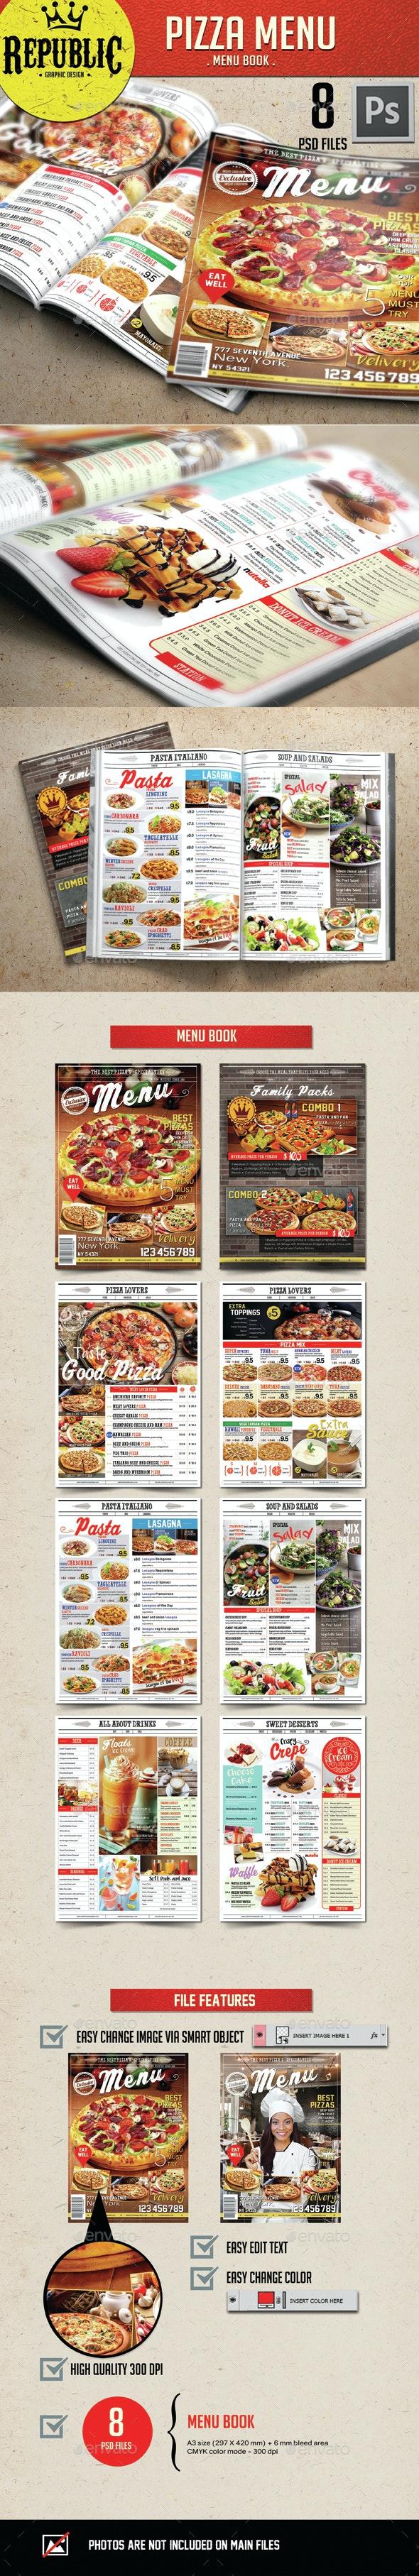 Restaurant Pizza Menu 1 - Food Menus Print Templates